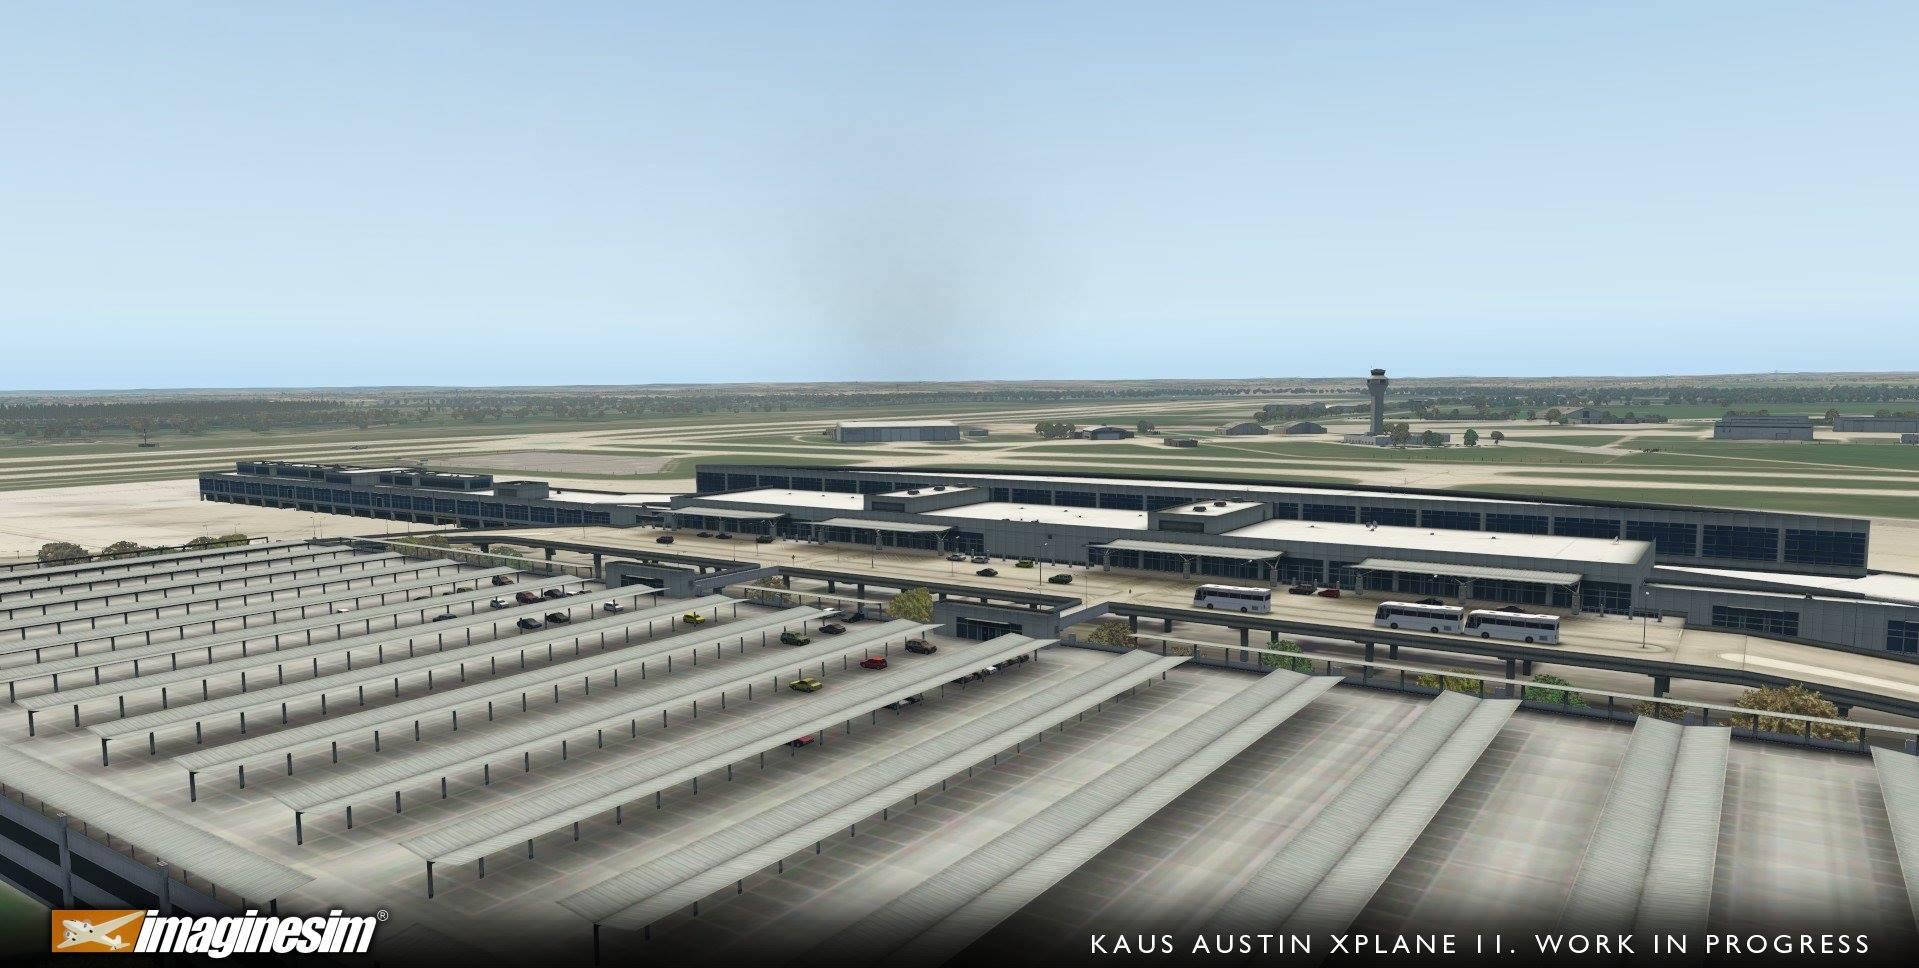 Imageinsim Austin X Plane 11 Kaus (5)